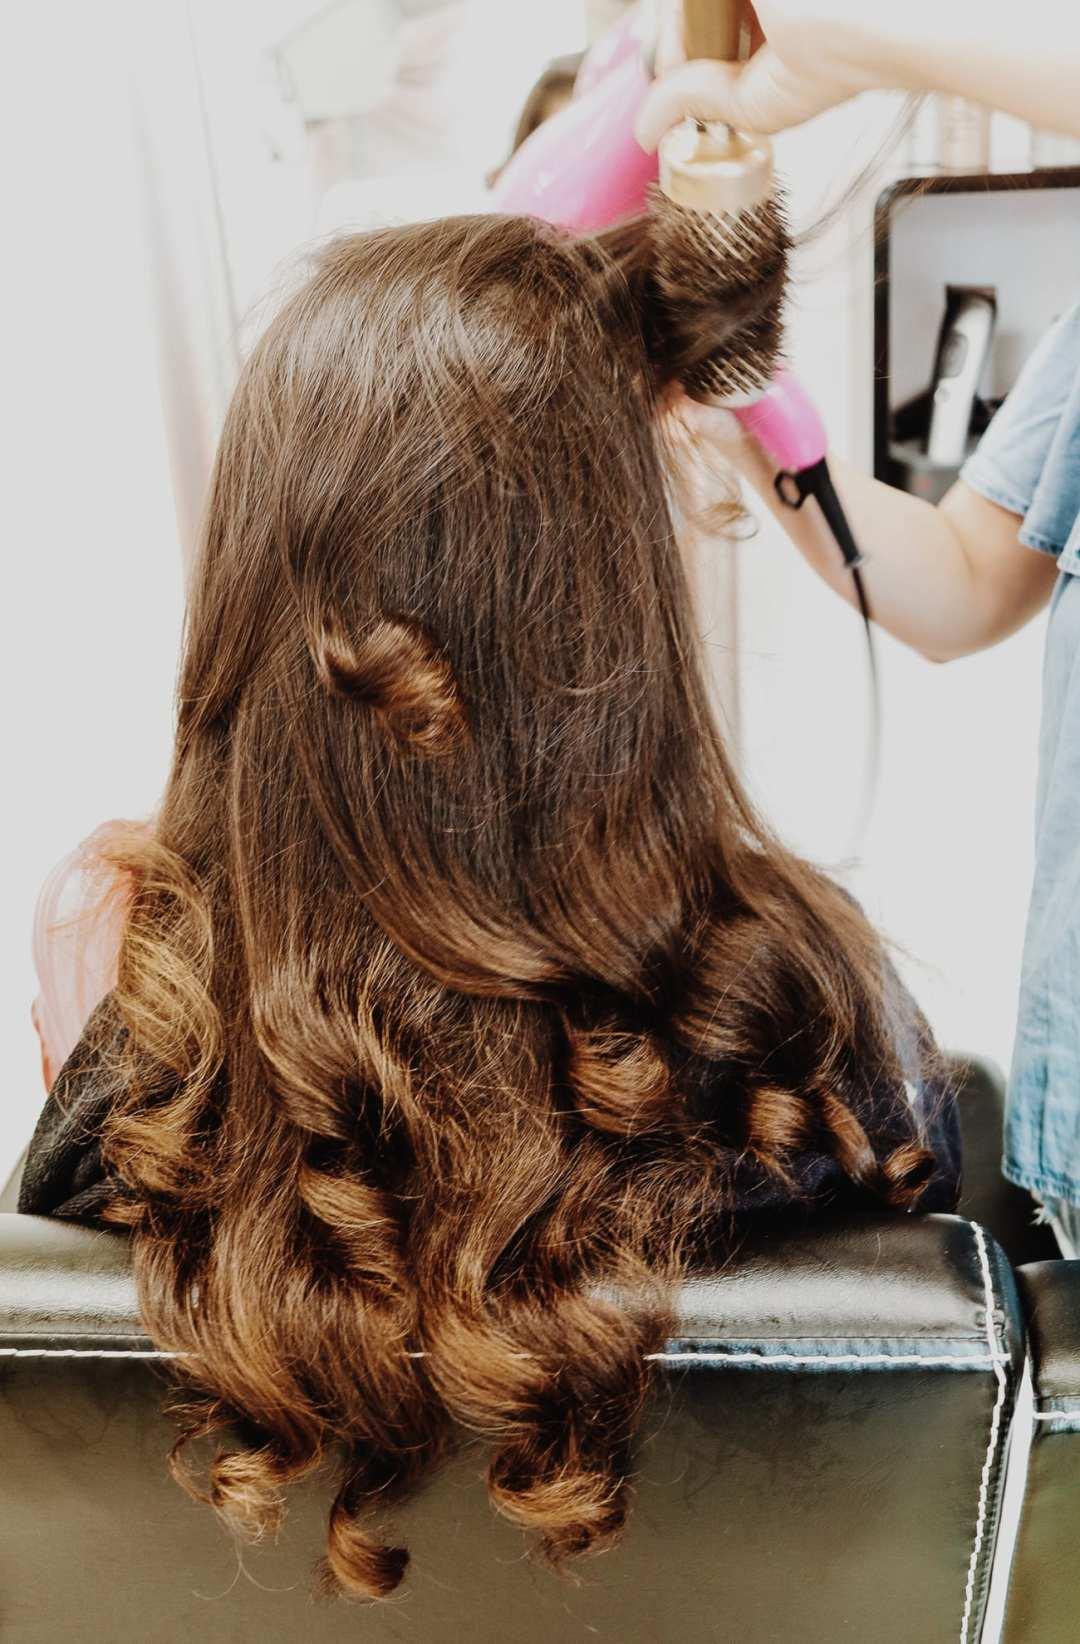 londa professional fiber infusion pret salon roxi rose tratament cheratina par cret efecte keratina pareri review beauty blog romania timisoara fashion lstudio timisoara laura jivan (10)